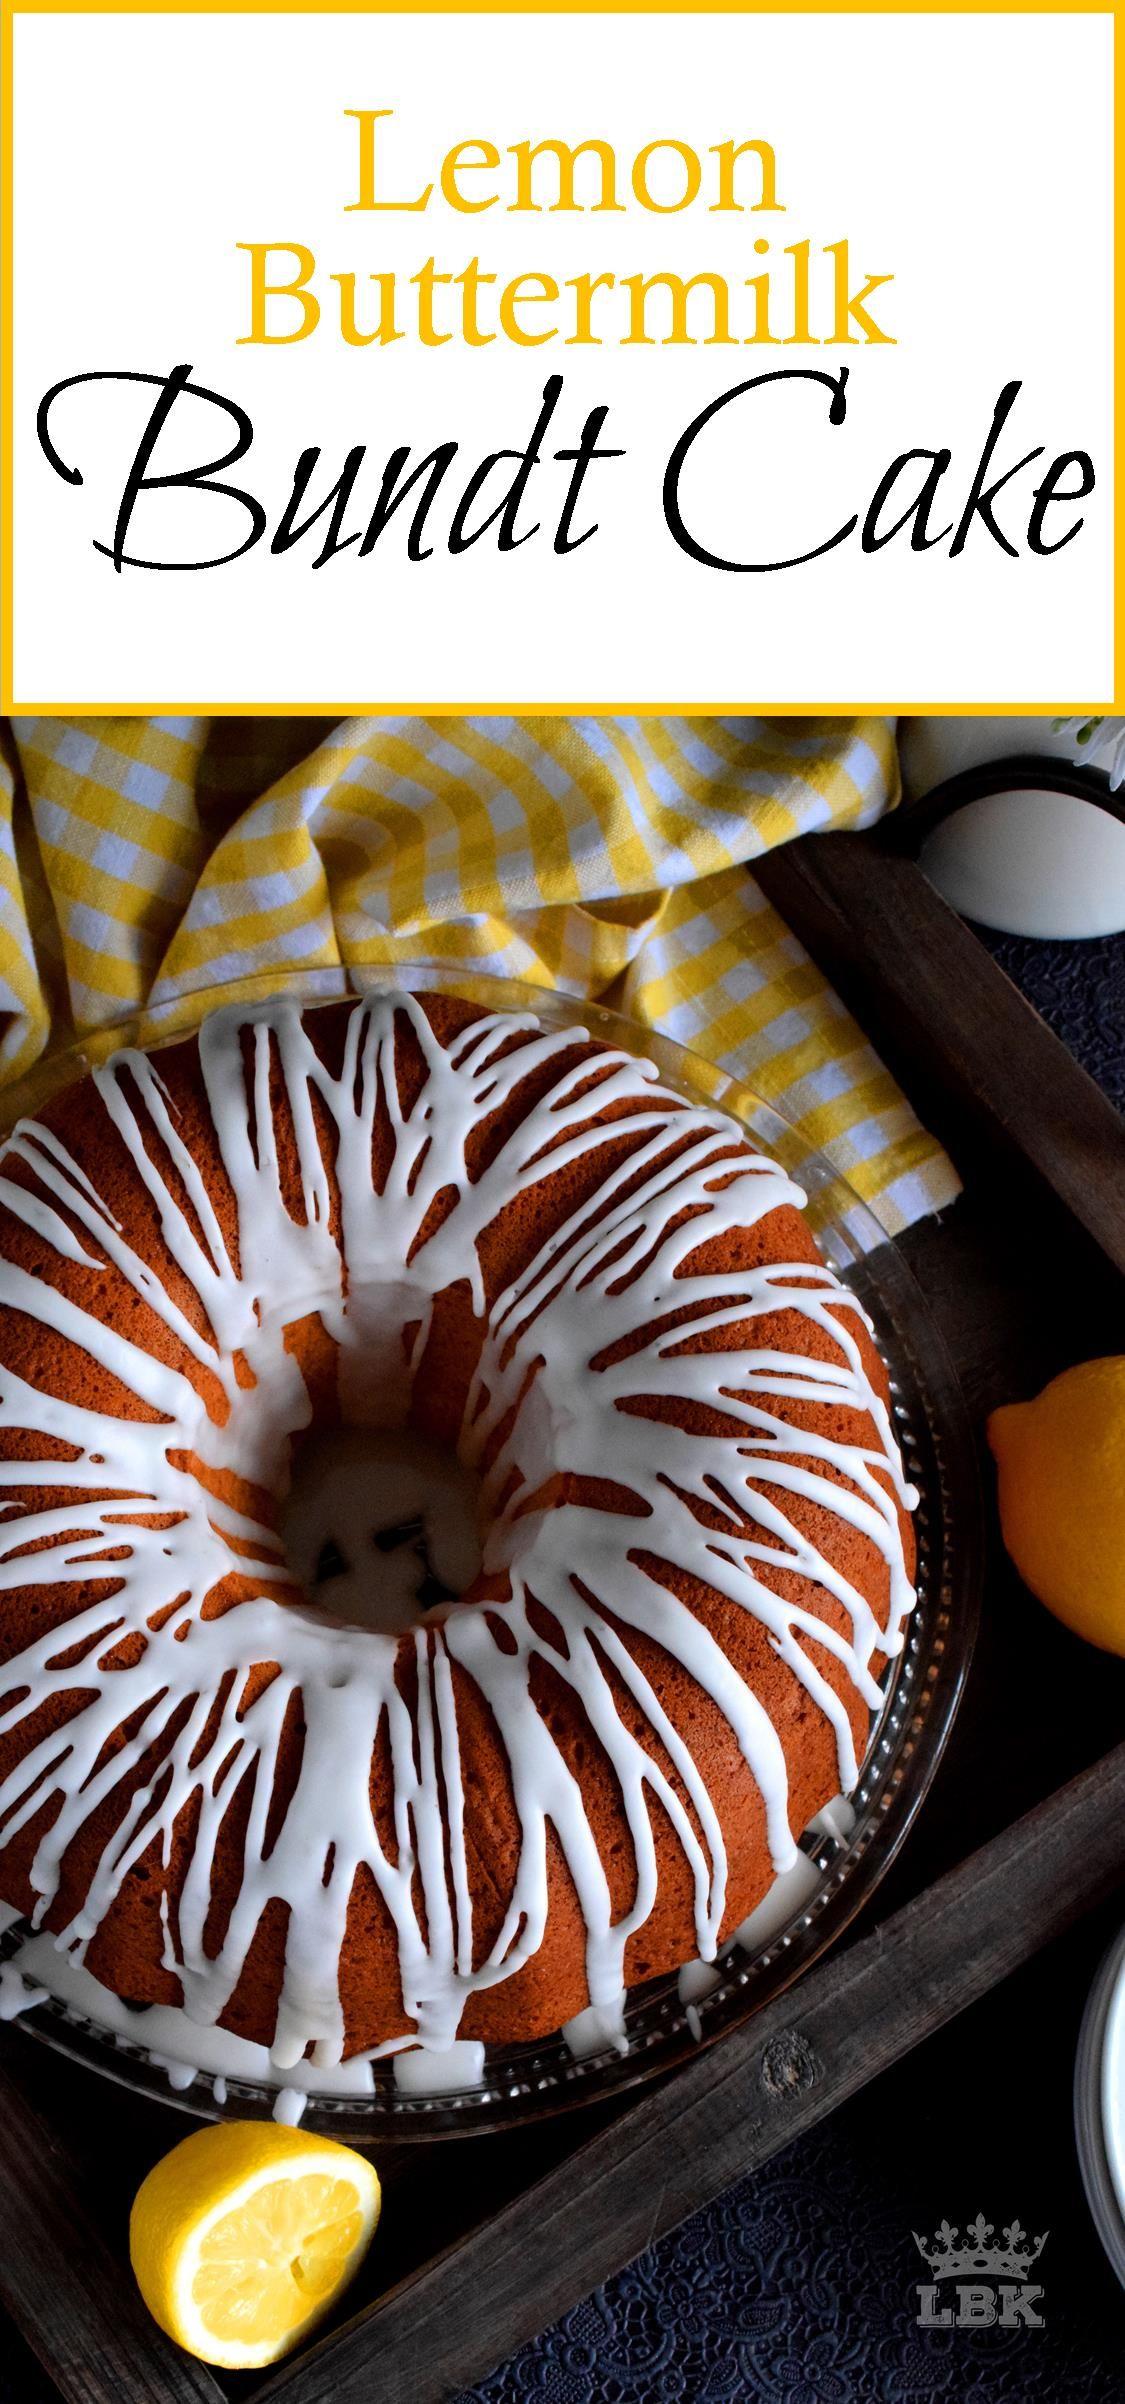 Lemon Buttermilk Bundt Cake Buttermilk Is The Secret To Keeping This Bundt A Super Moist And Lemon Fresh Cake Add A Lemon Recipes Dessert Recipes Bunt Cakes